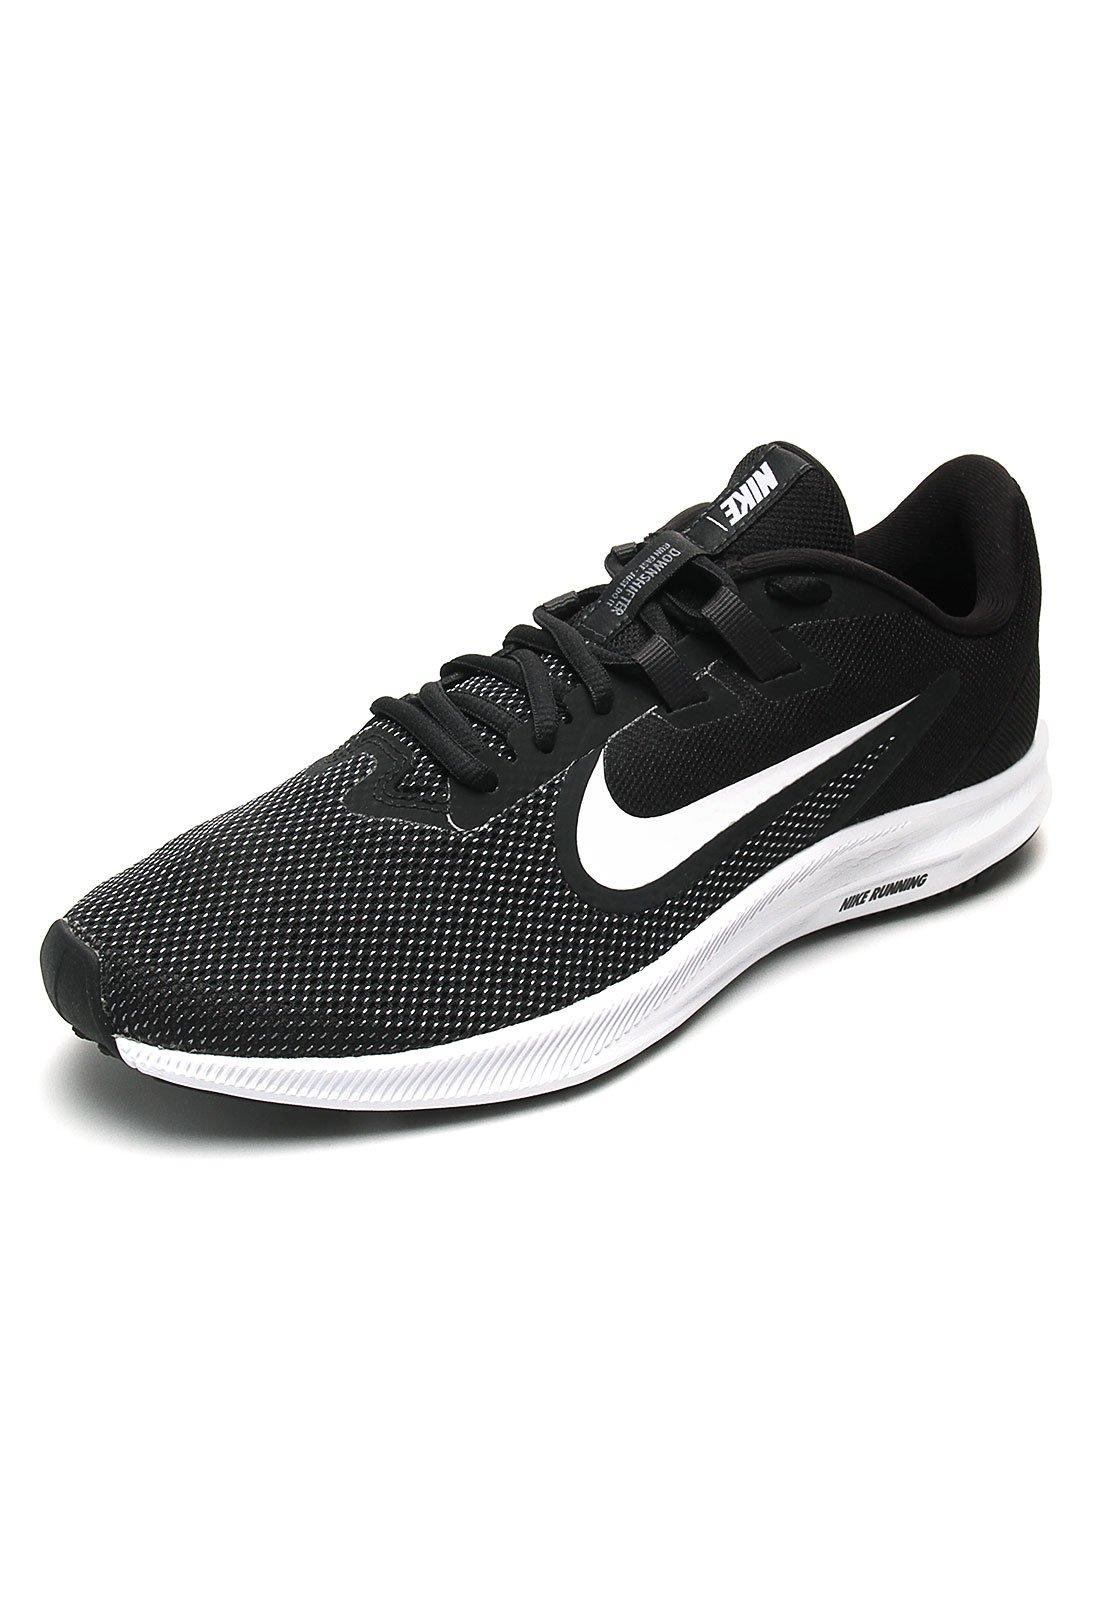 Tenis Running Negro-Blanco Nike Downshifter 9